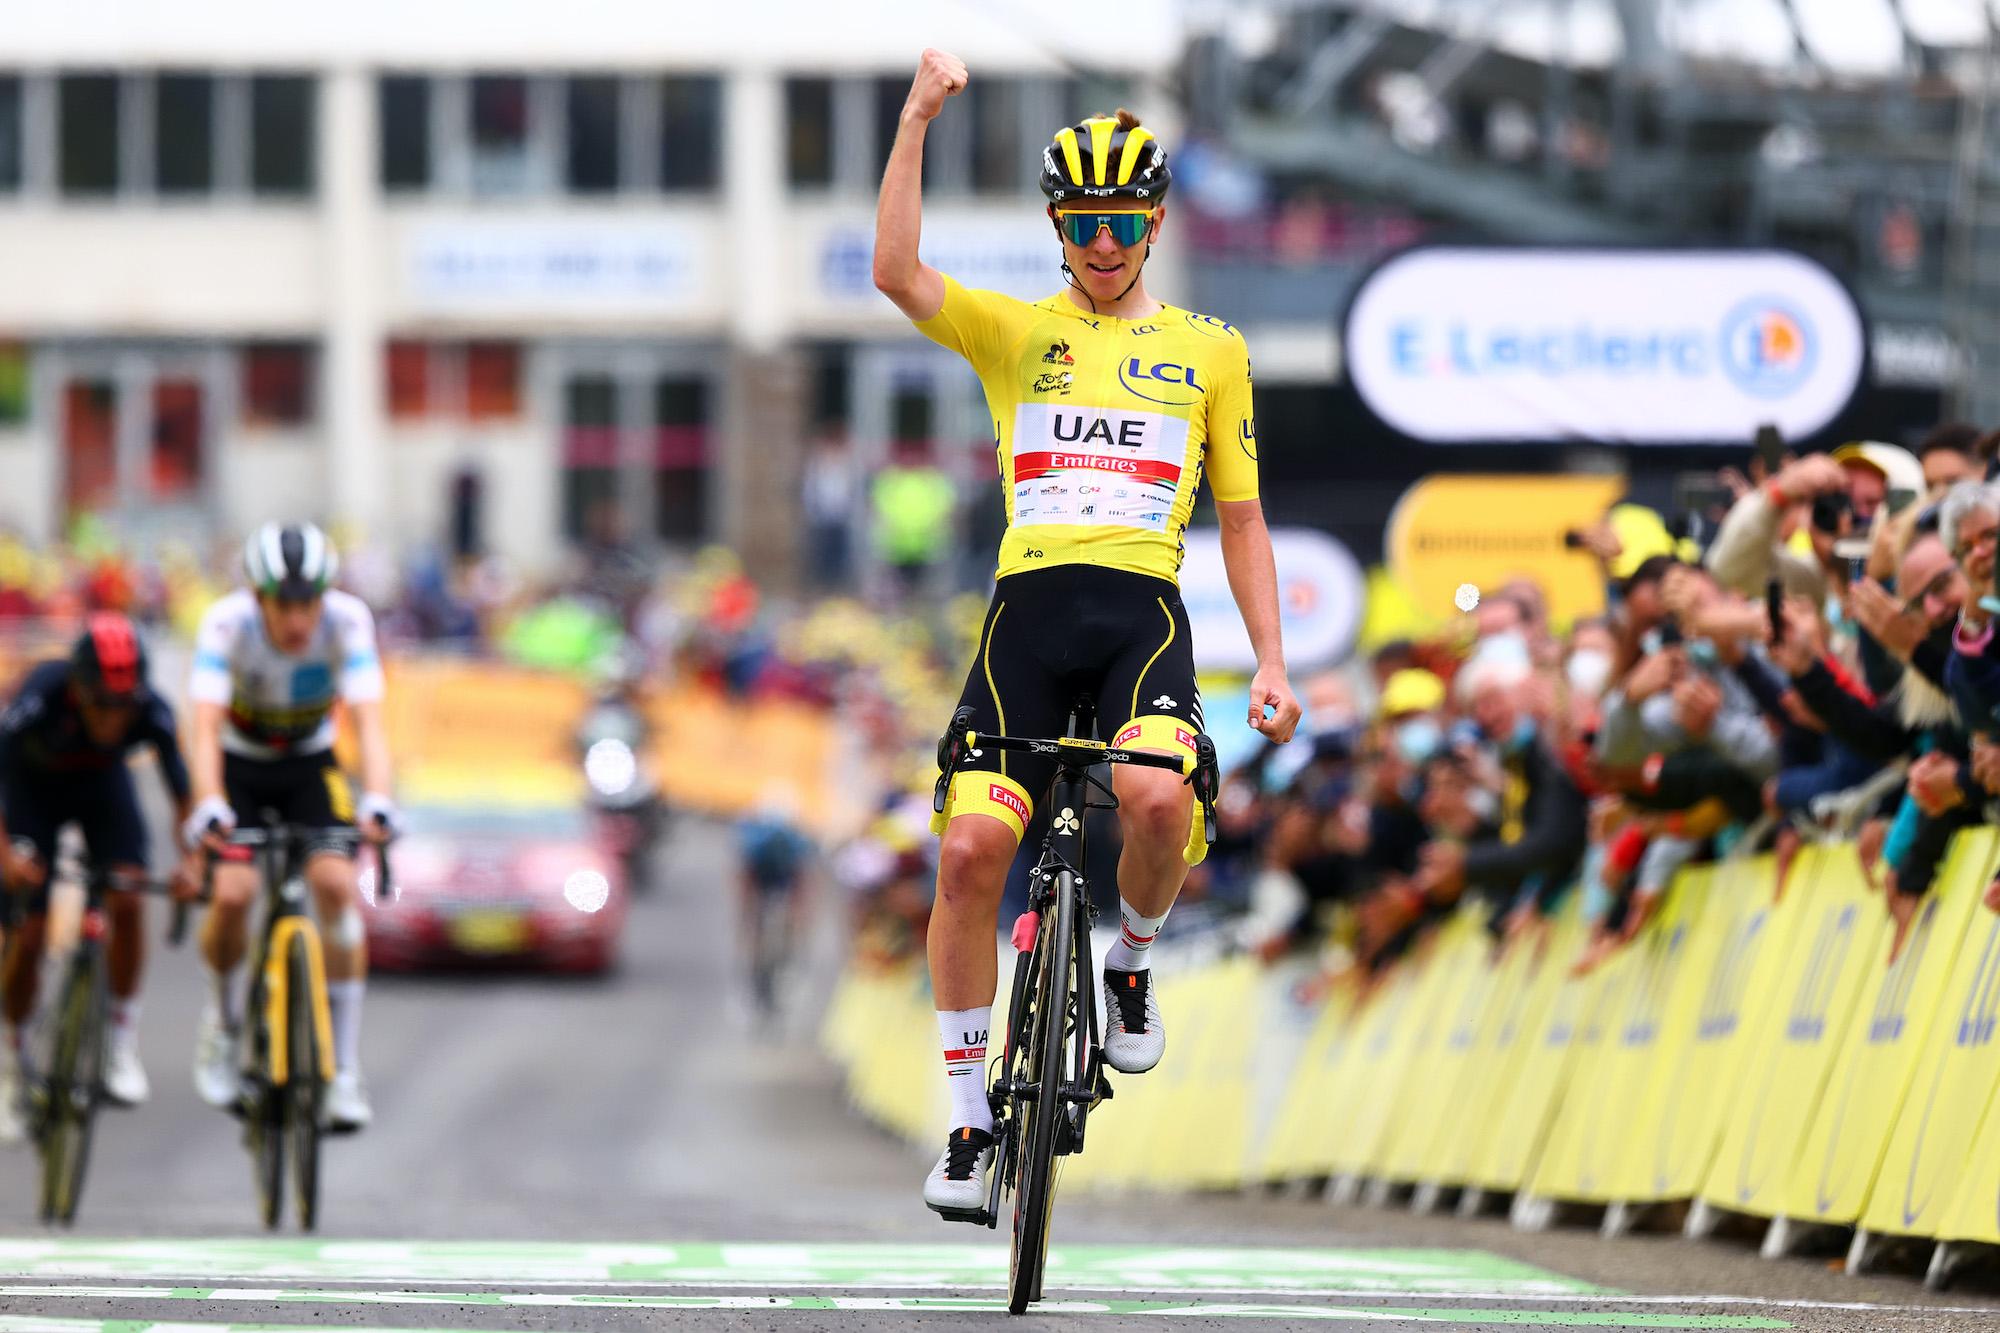 Tadej Pogacar wins stage 18 of the 2021 Tour de France